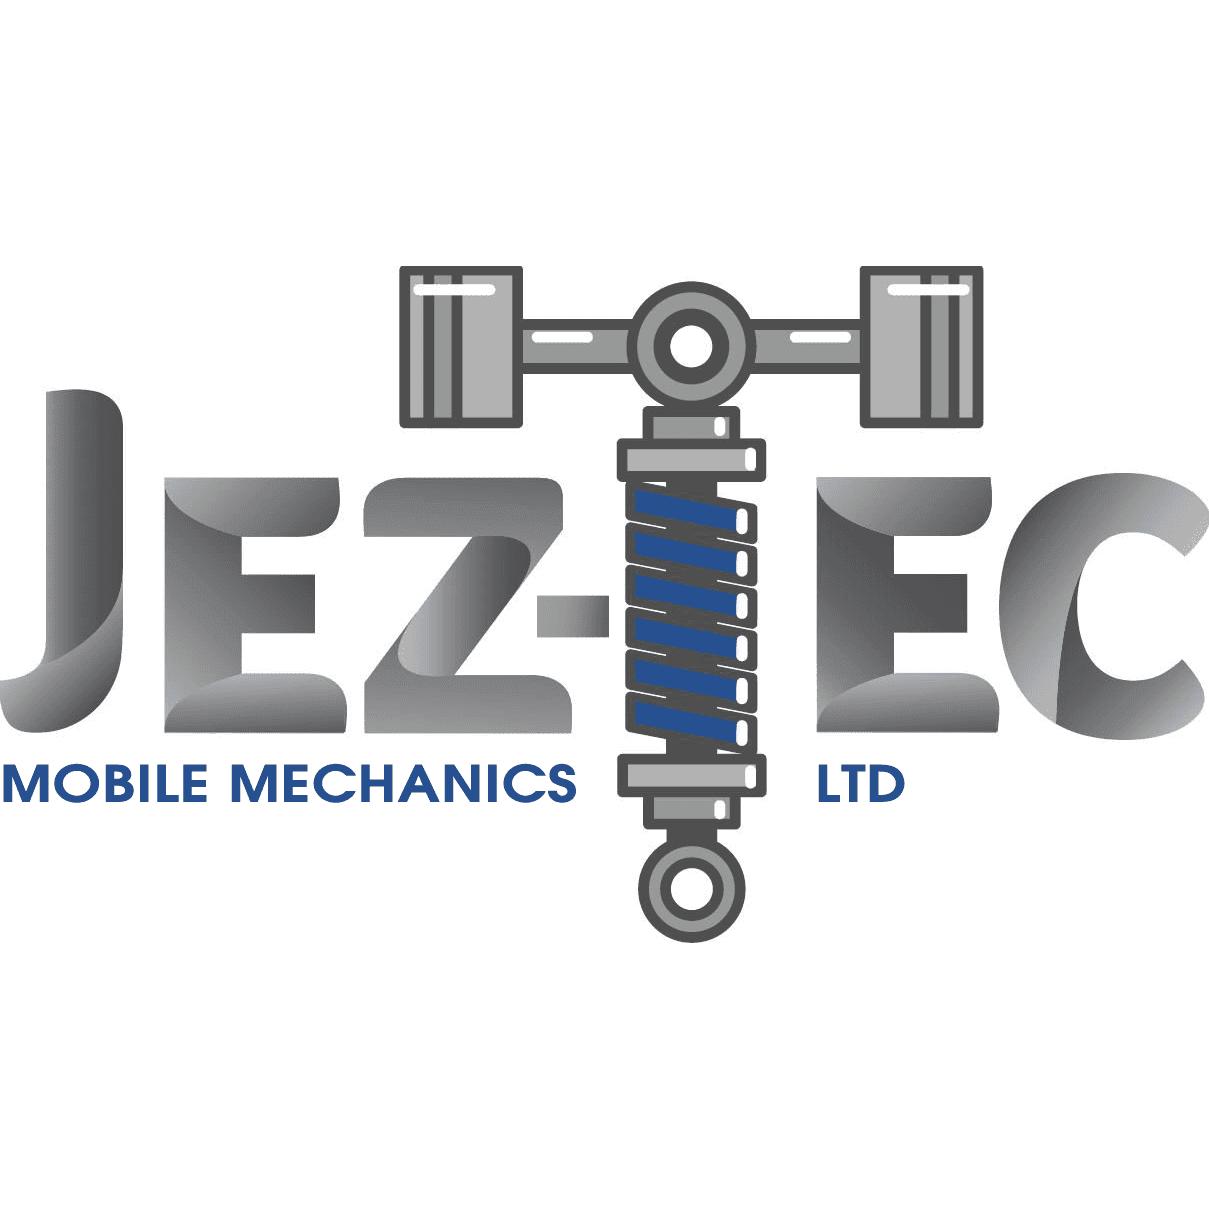 Jez-Tec Mobile Mechanics Ltd - Reading, Berkshire RG31 7AH - 01189 418806 | ShowMeLocal.com